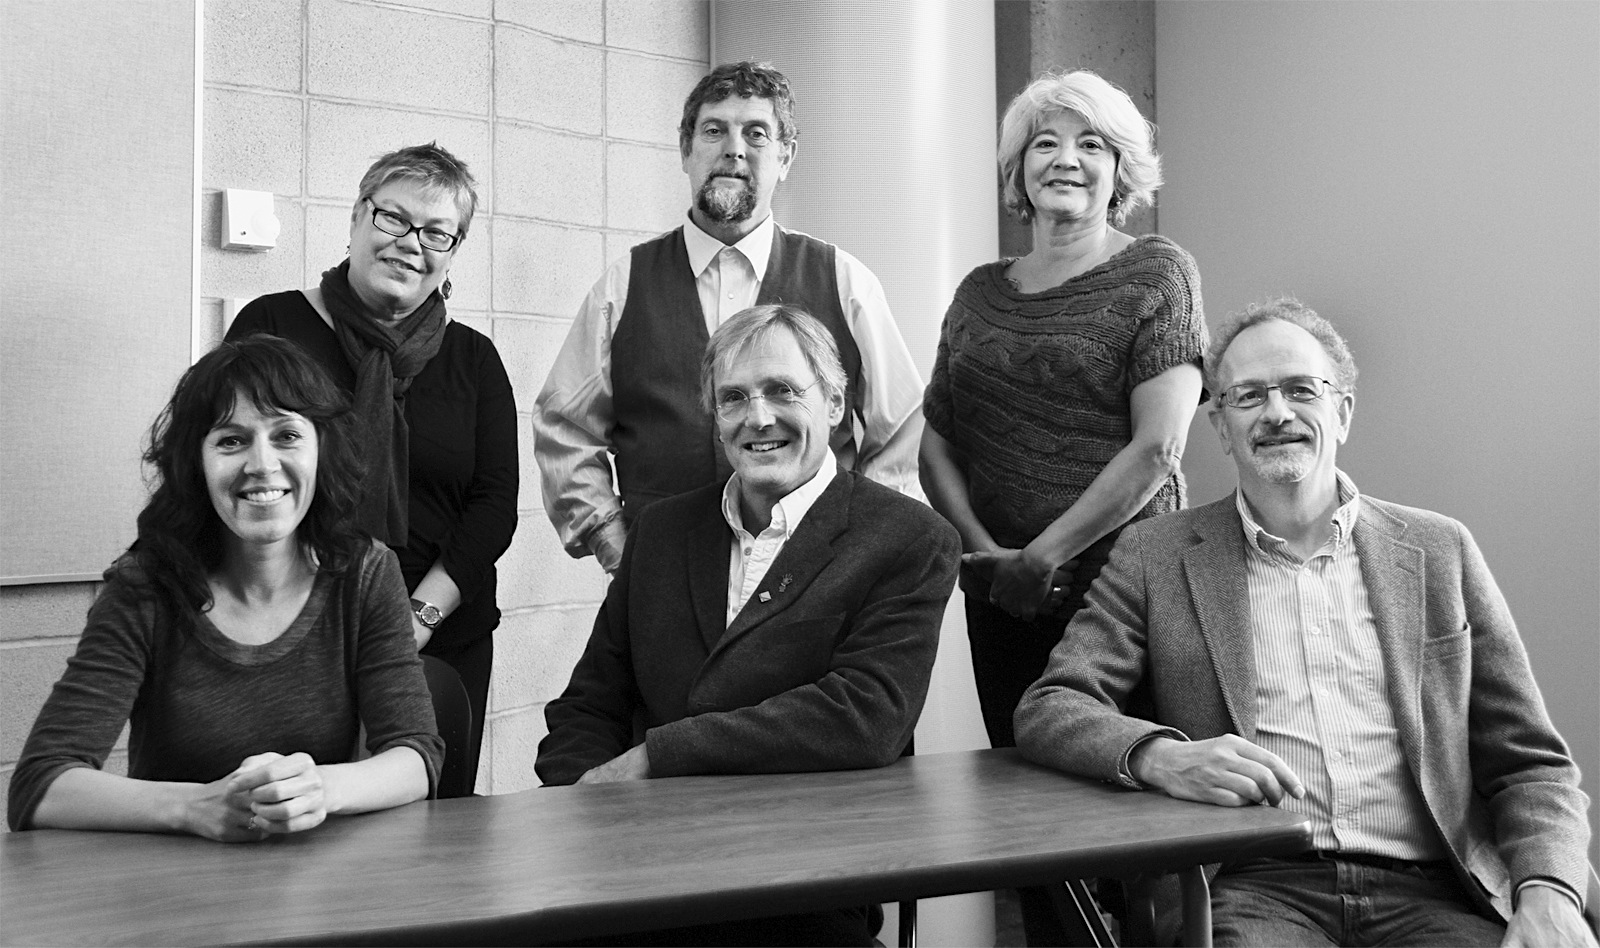 (Back, L to R) Alanna Mitchell, Gary Paul Nabhan, Louise B. Halfe; (Front) Chantal Bilodeau, Peter von Tiesenhausen, Scott Denning